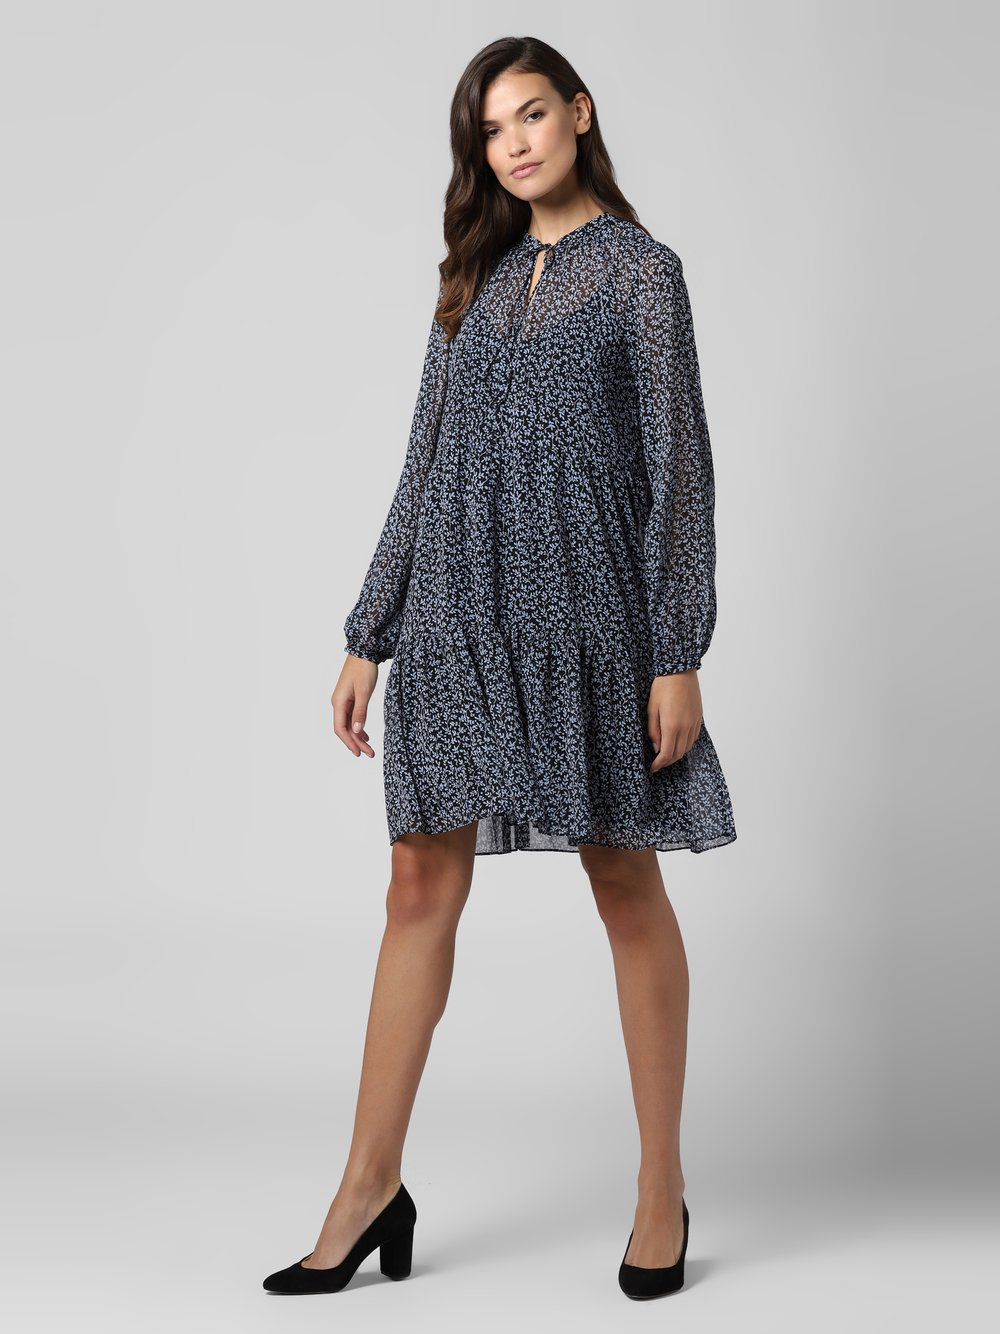 mbyM – Sukienka damska – Kenda, niebieski Van Graaf 484633-0001-09900